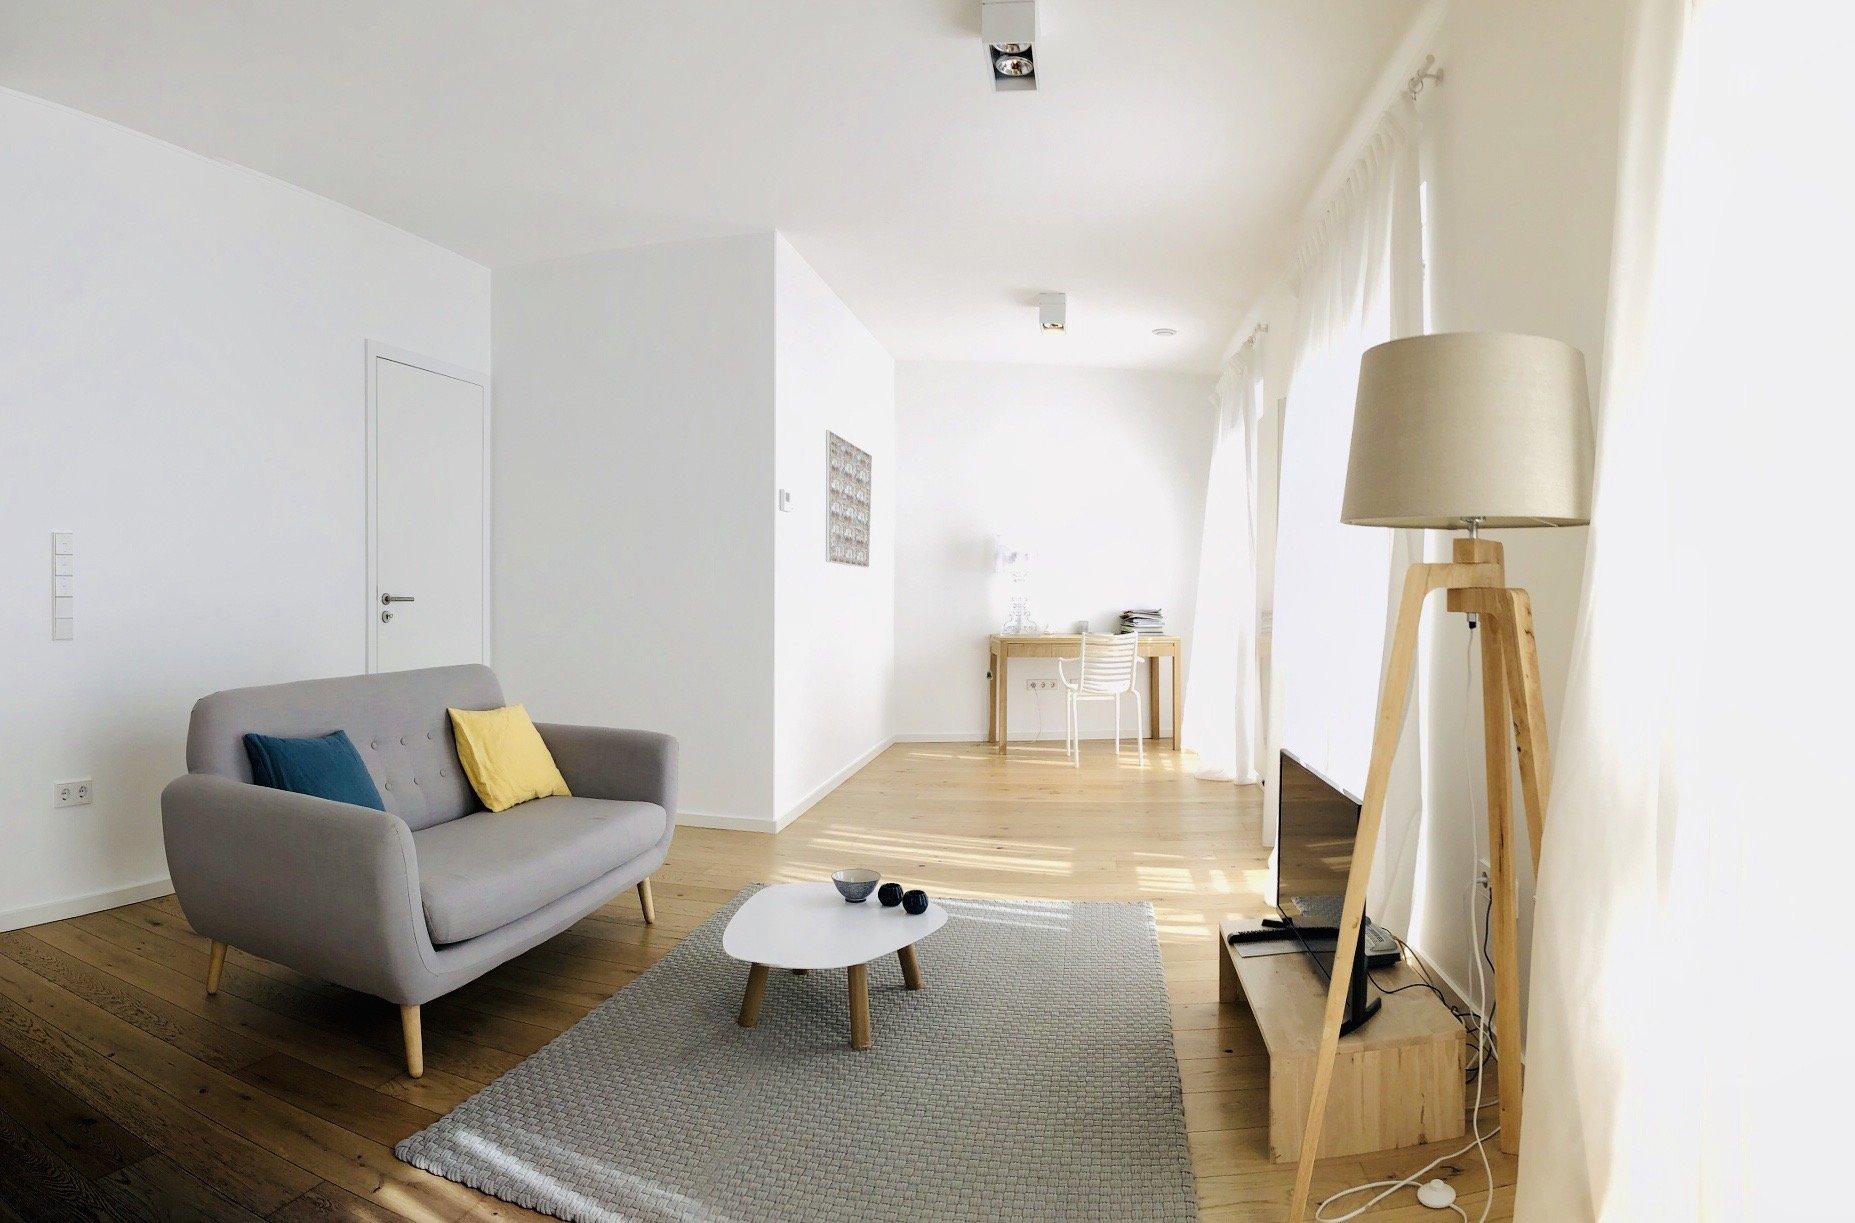 A LOUER - Appartement 1 chambre meublé - Luxembourg-Gare